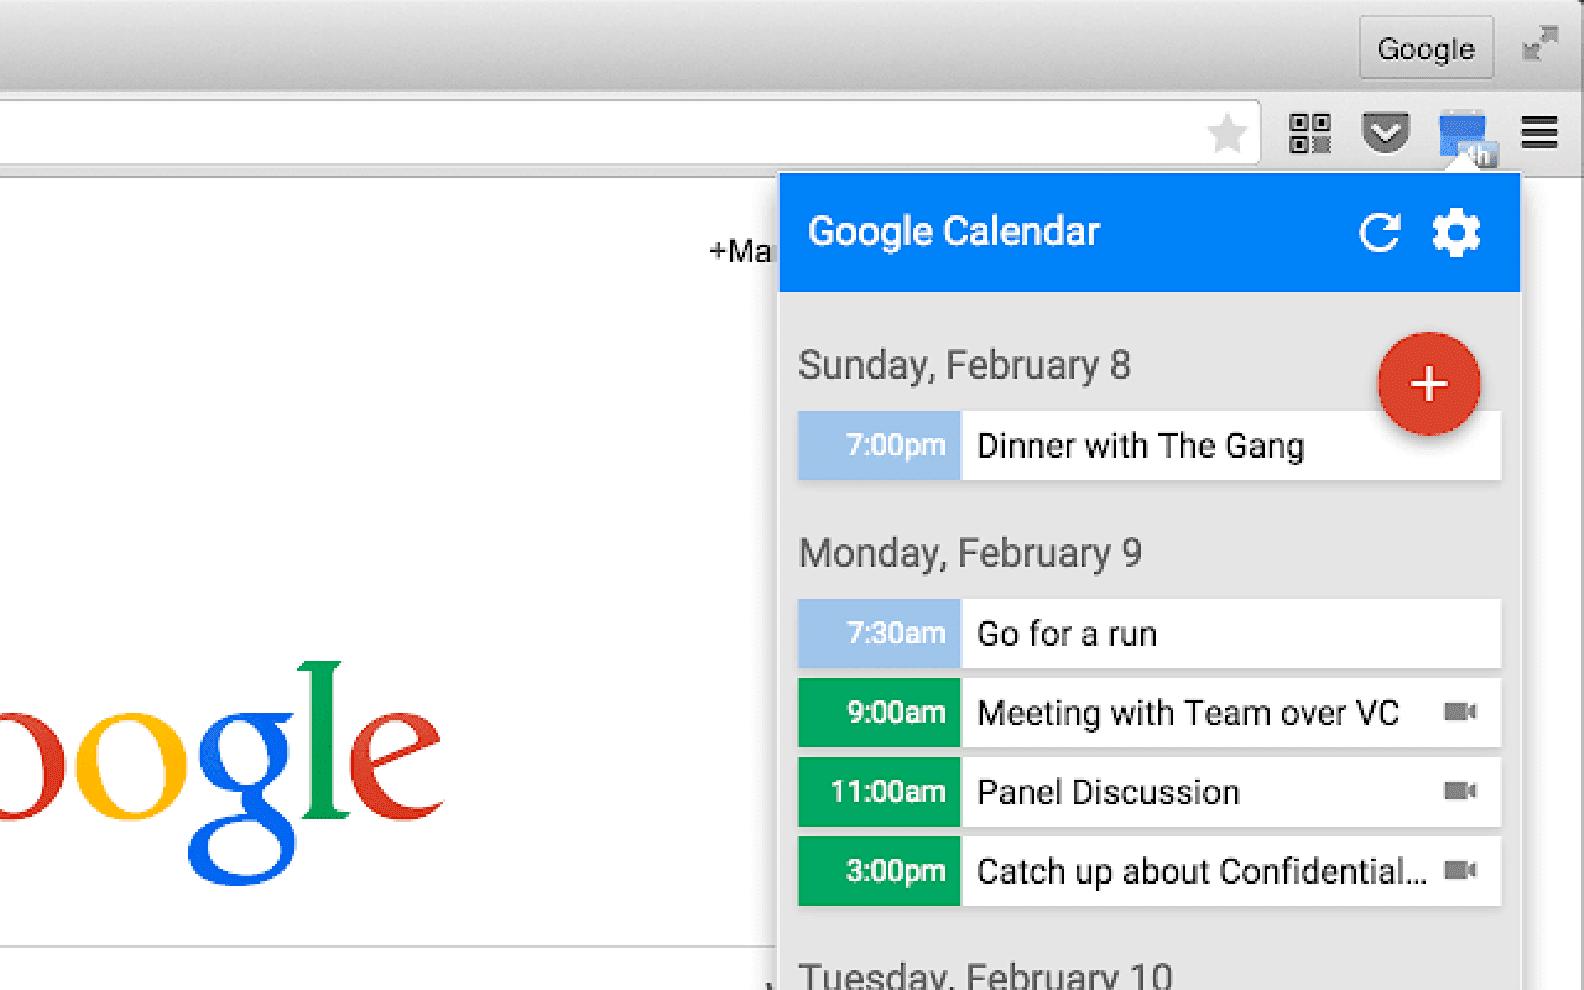 Google Calendar Chrome extension in use.